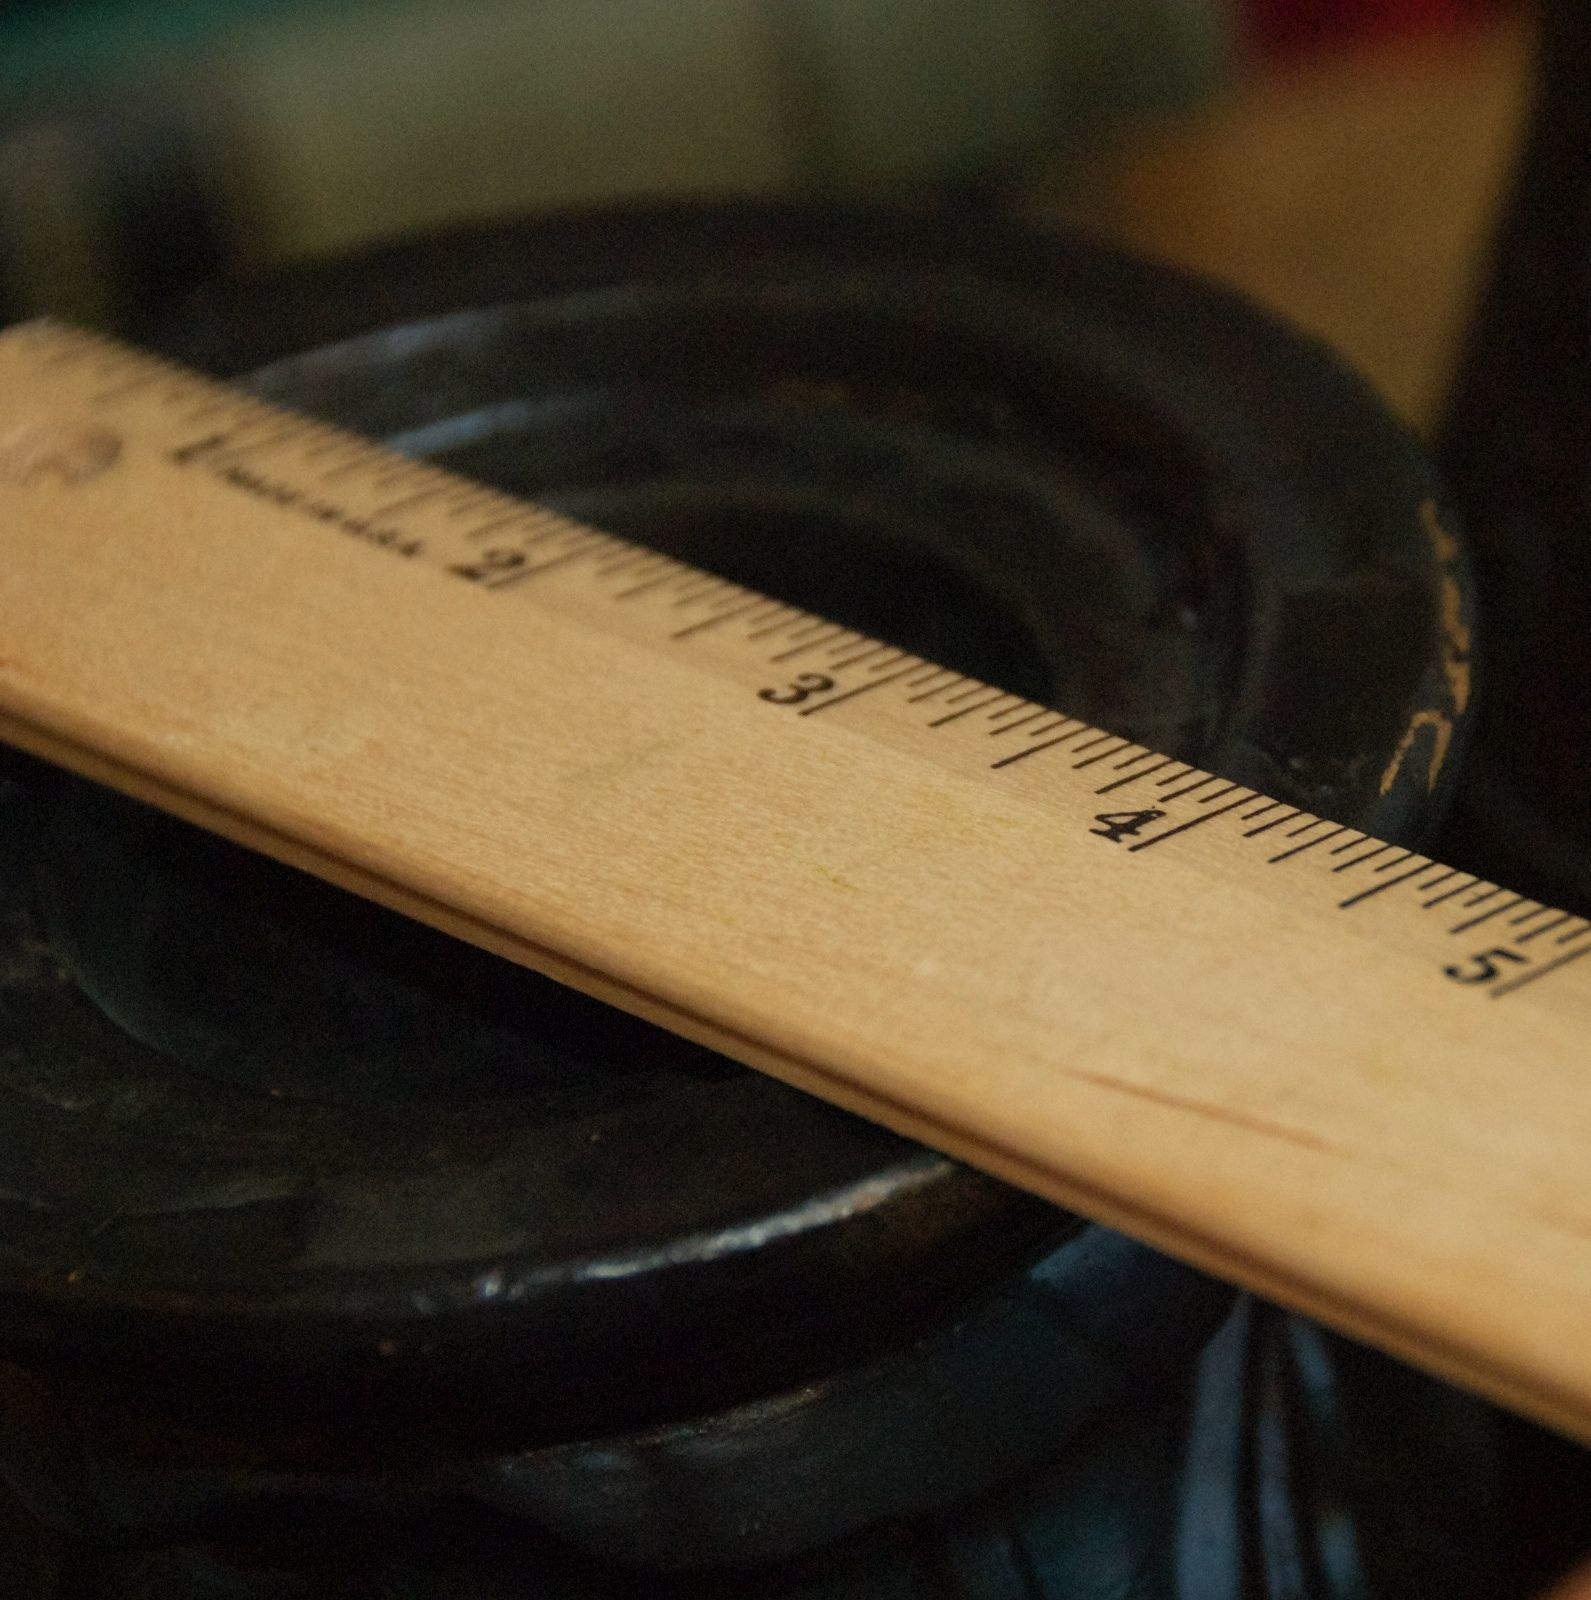 "VINTAGE LENOX PILLAR CANDLE HOLDER CERAMIC BLACK GOLD ART NOUVEAU NEEDS TLC 7"" H"